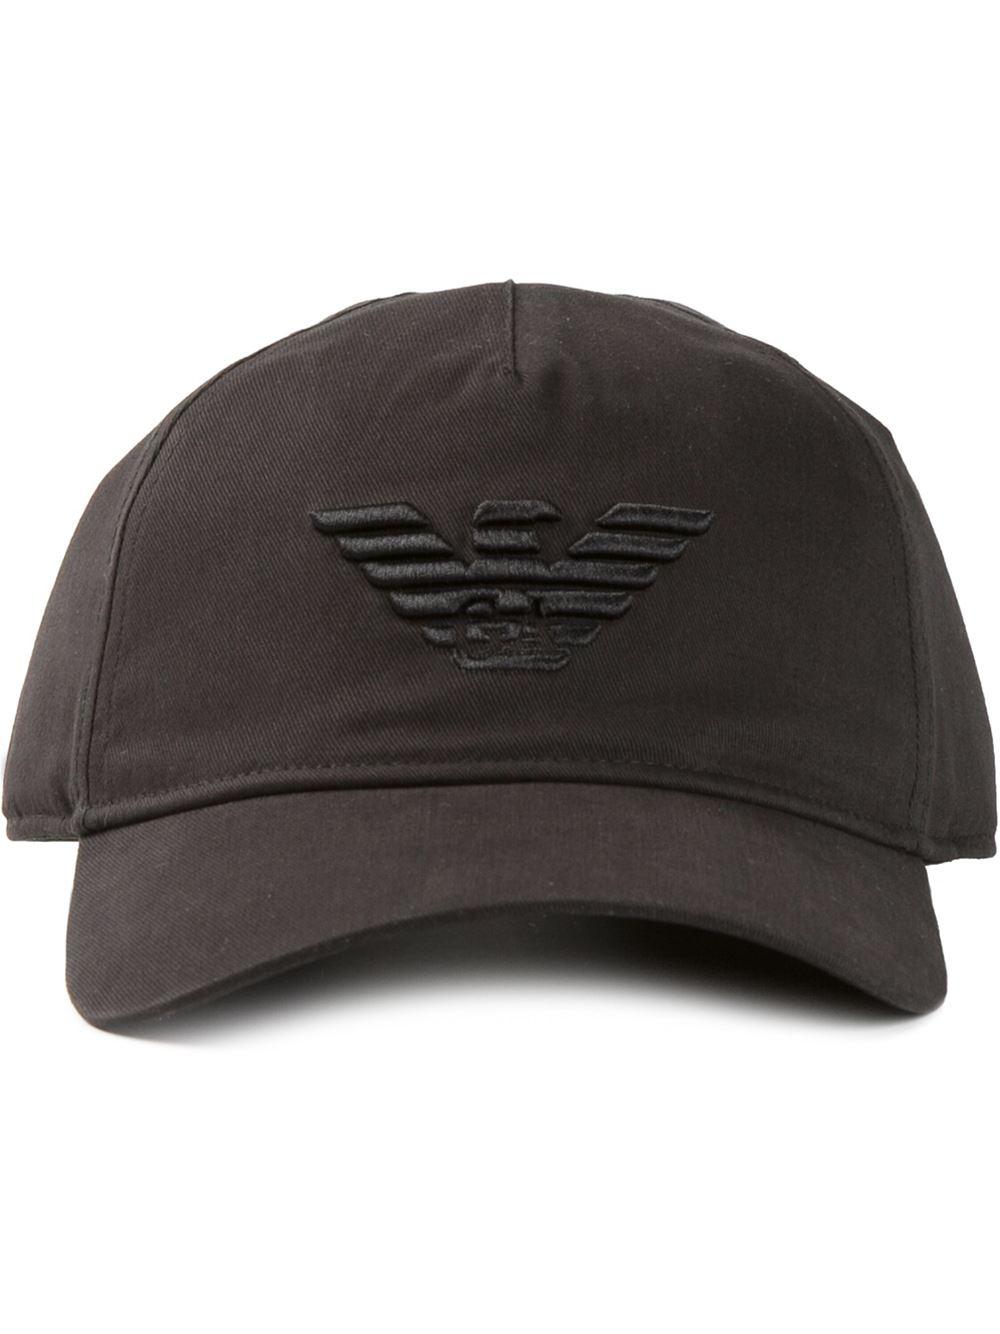 Emporio Armani Logo Embroidered Baseball Cap in Black for Men - Lyst effc66d3c87